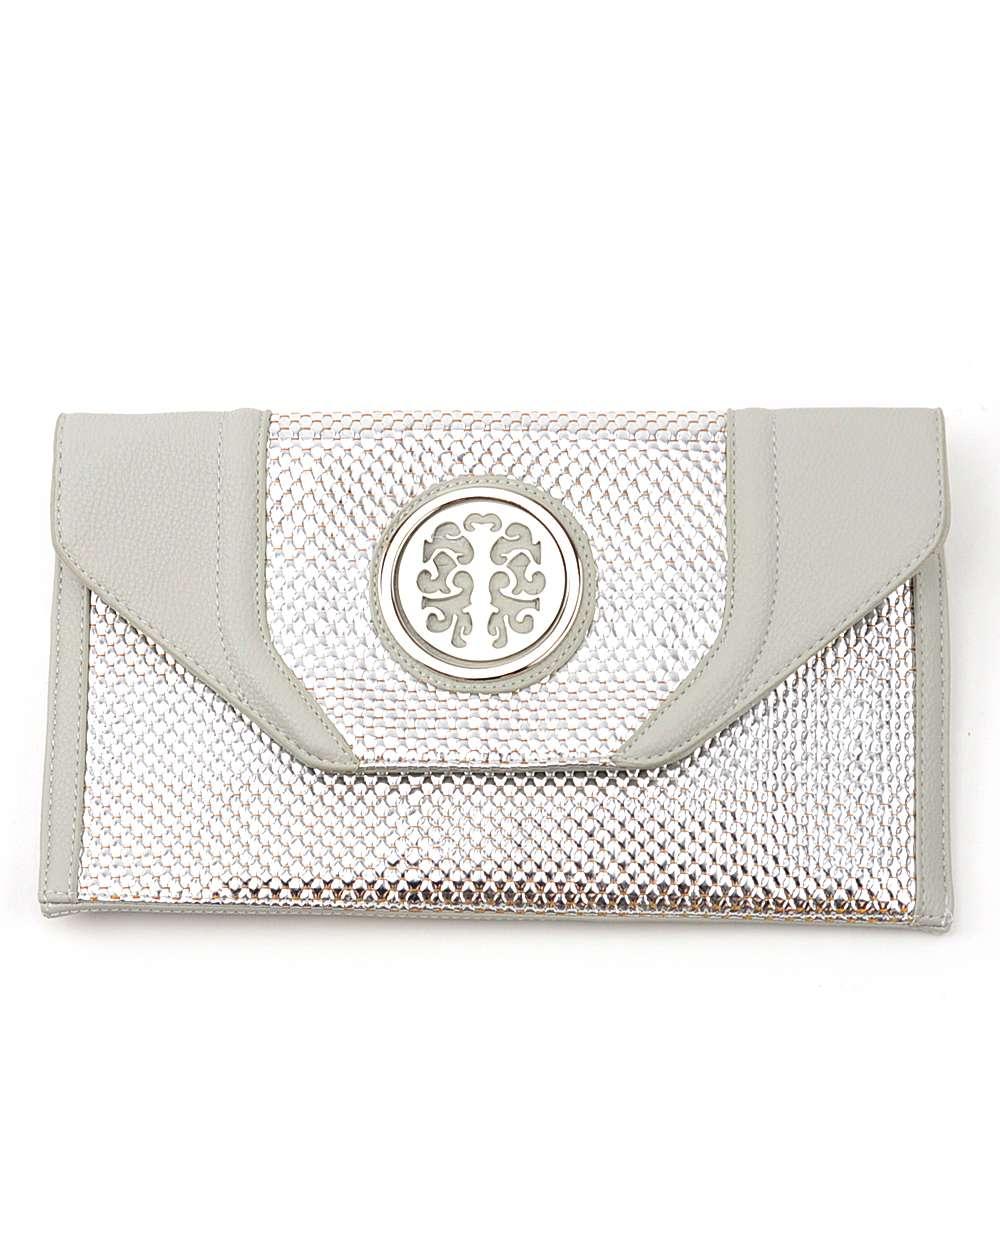 NYFashion101 (TM) Women's Dressy Metallic Envelope Clutch by Galian RILW33K at Sears.com